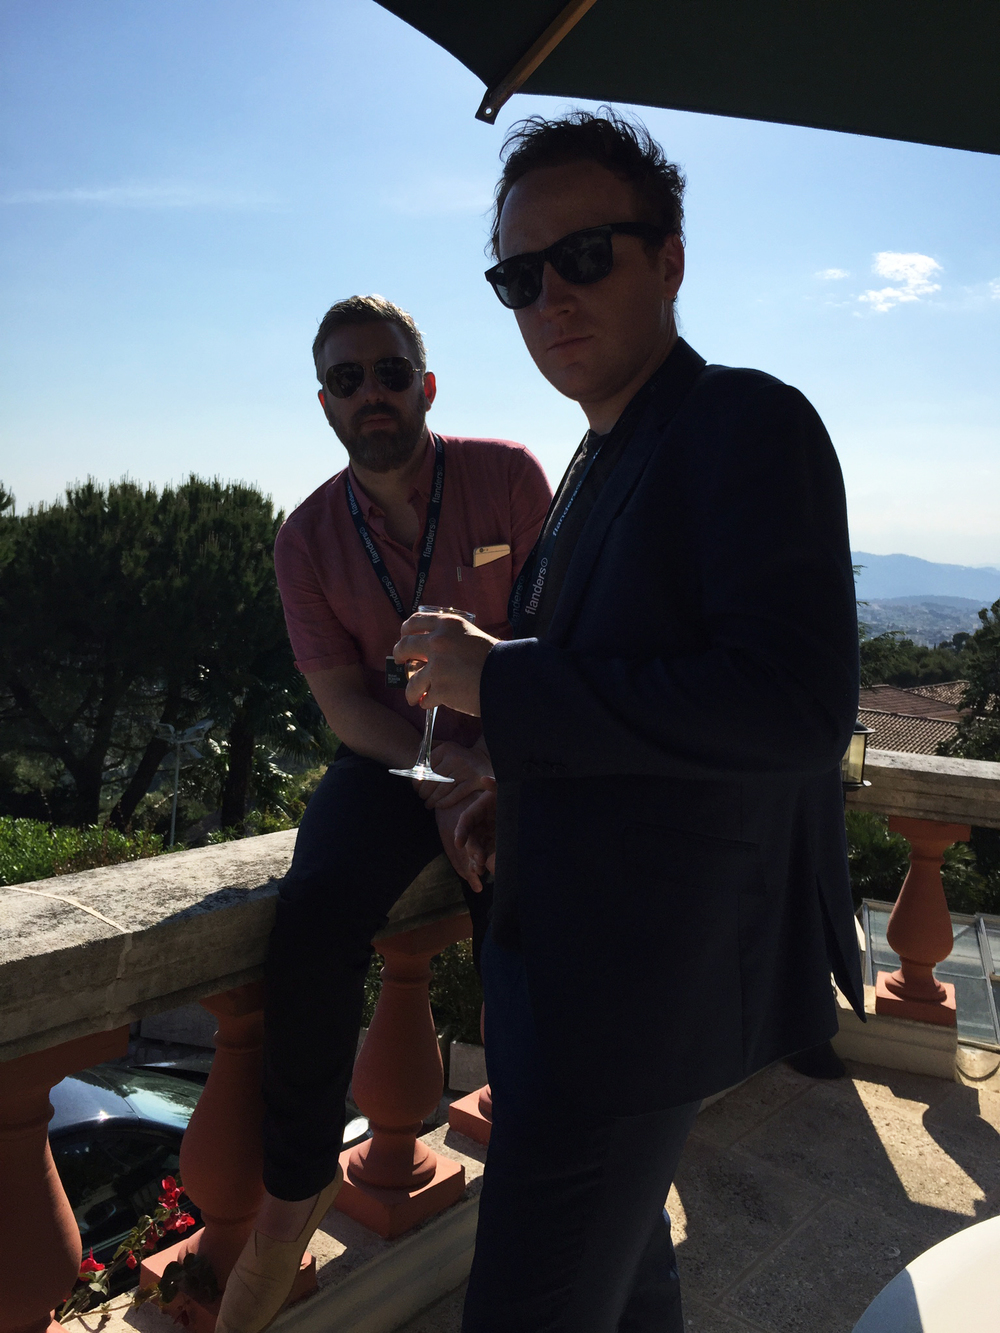 M J McMahon and Matthew Jones at the Molinare villa